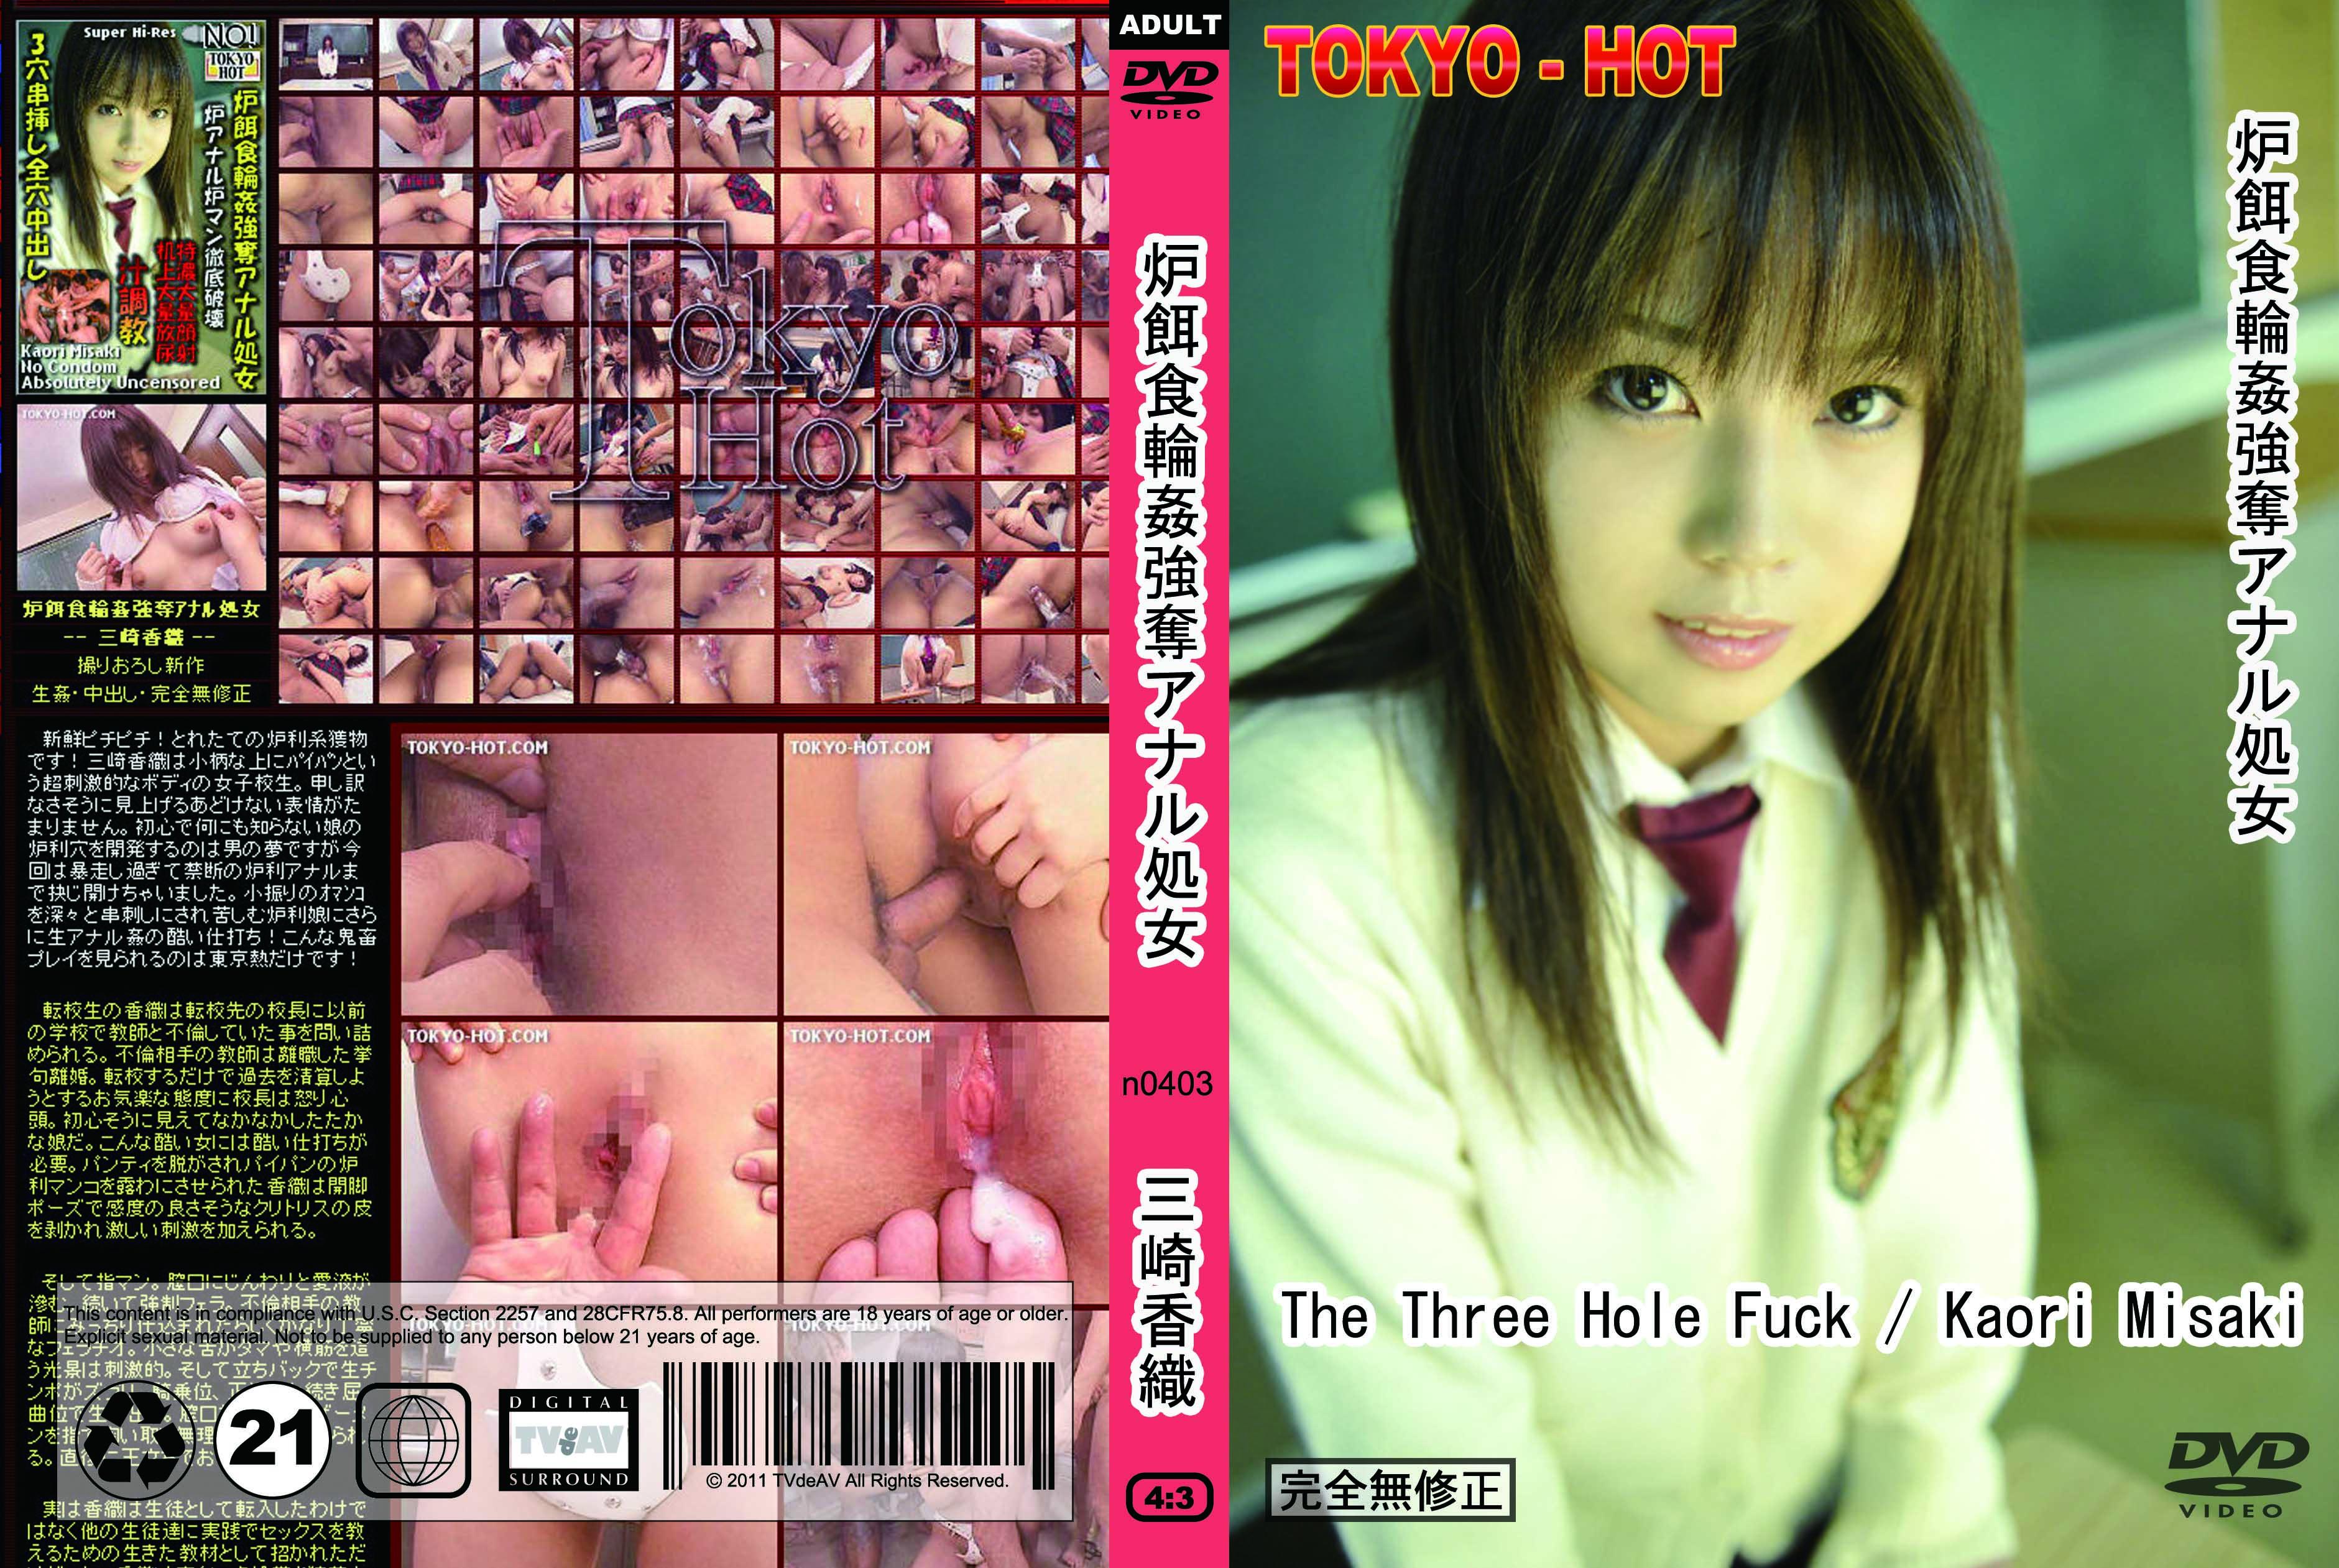 tokyo-hot-n0403-cd2-爐餌食輪奸強奪アナル処女三崎香織